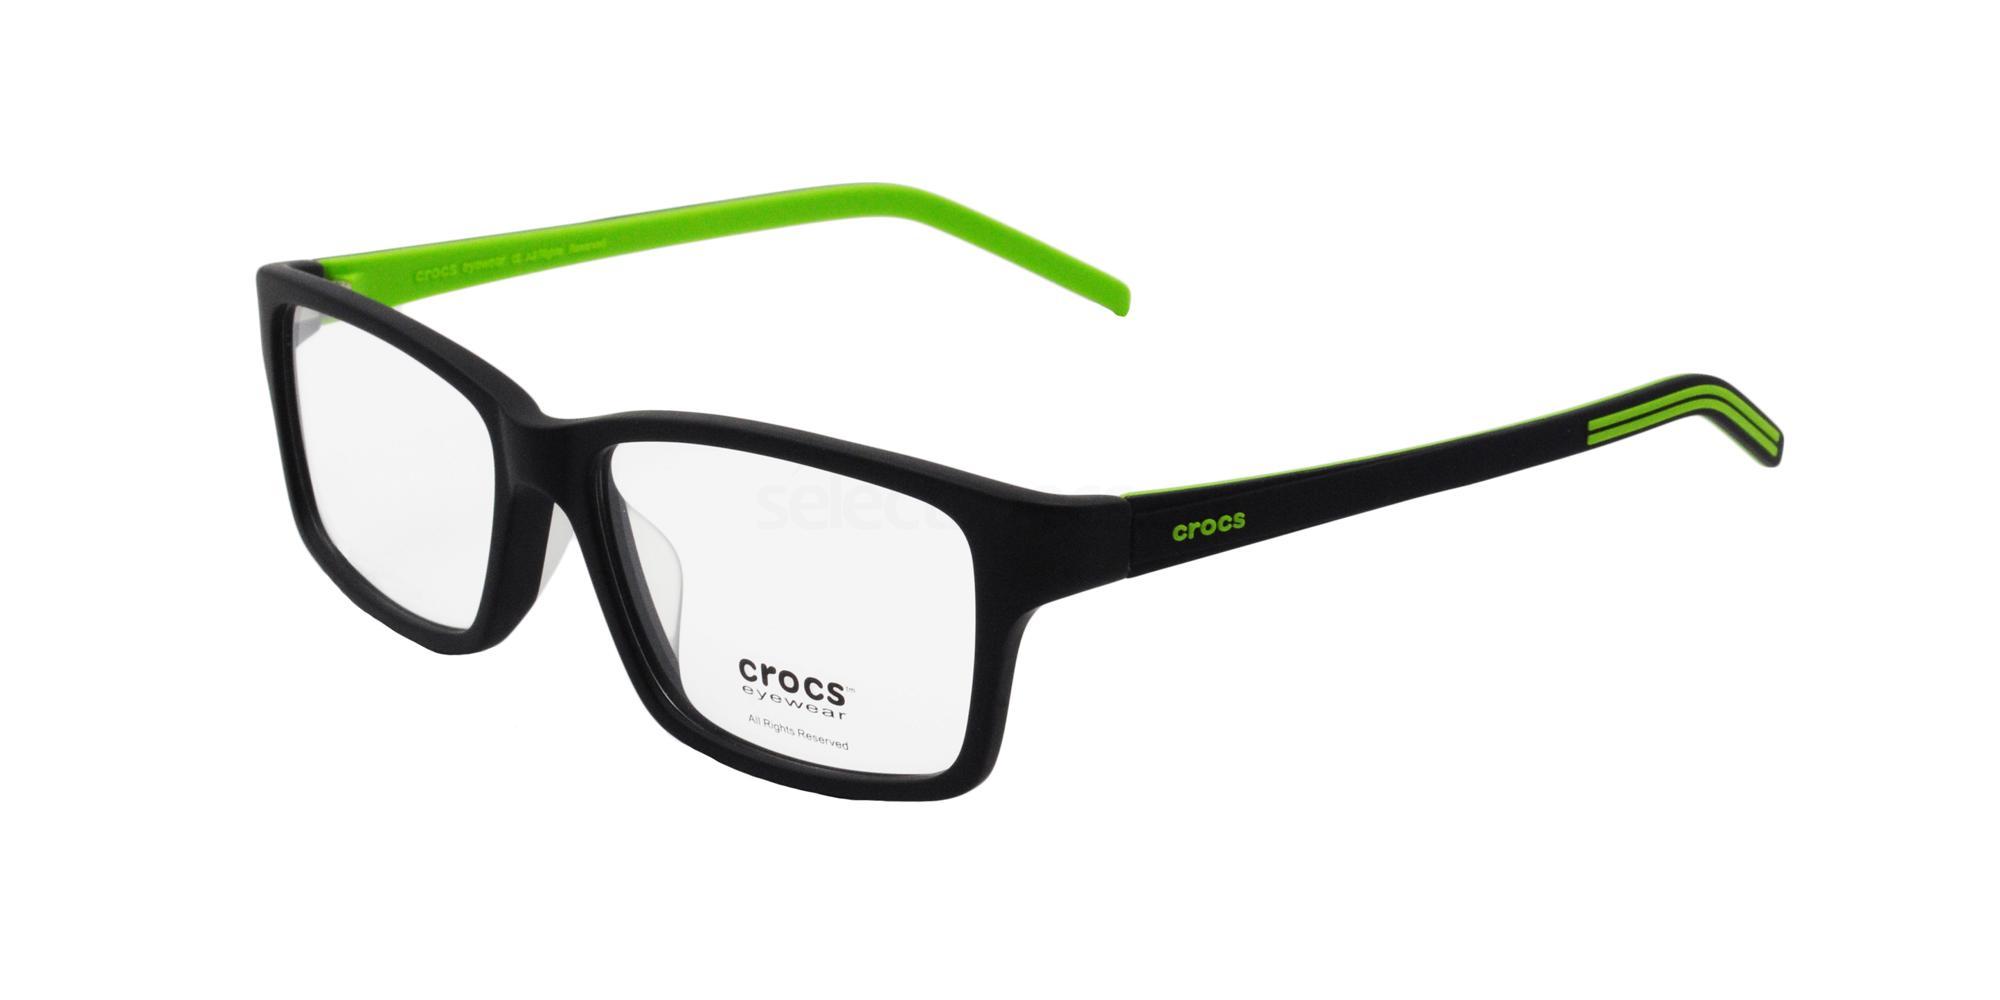 20GN CF 393 Glasses, Crocs Eyewear